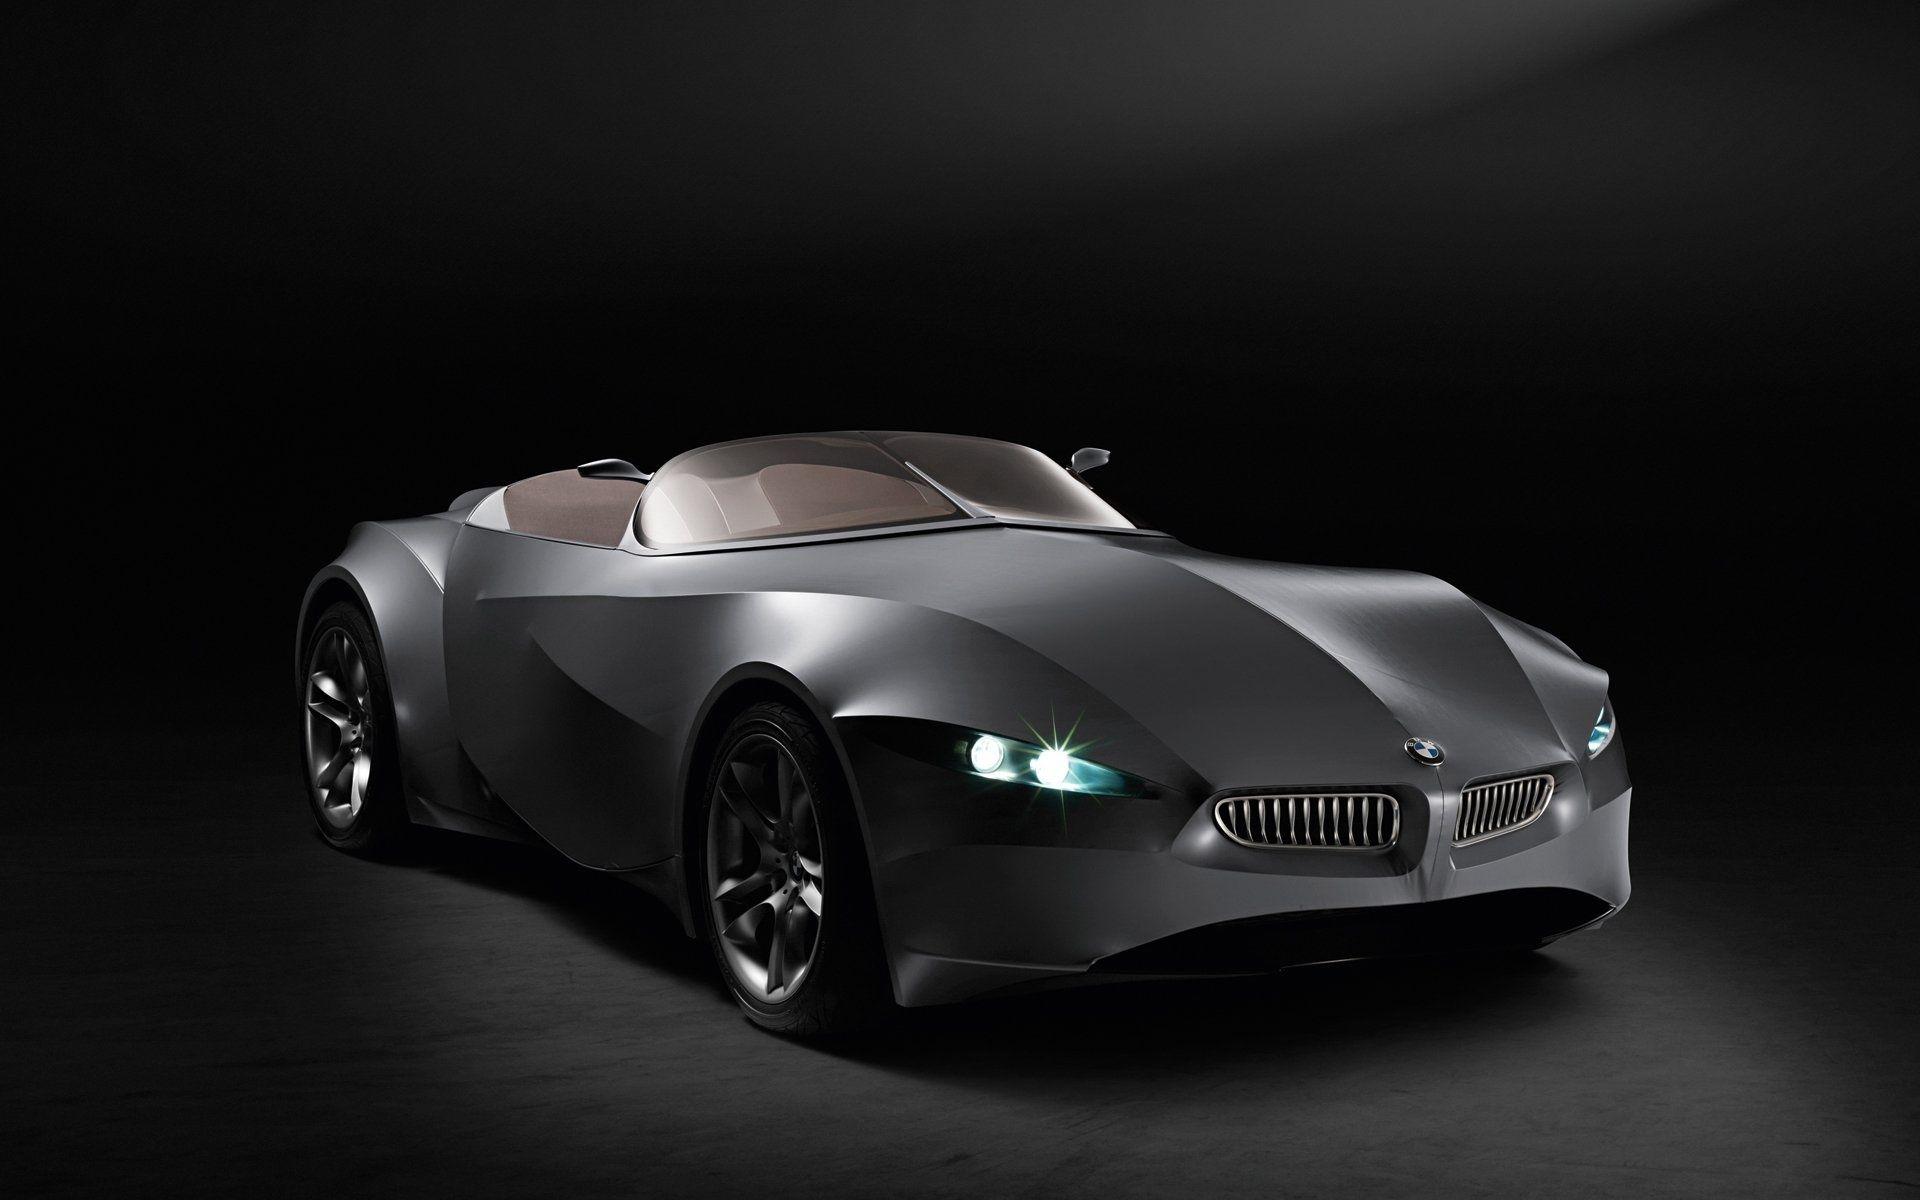 BMW M Concept Design Wallpaper Cars Wallpapers HD